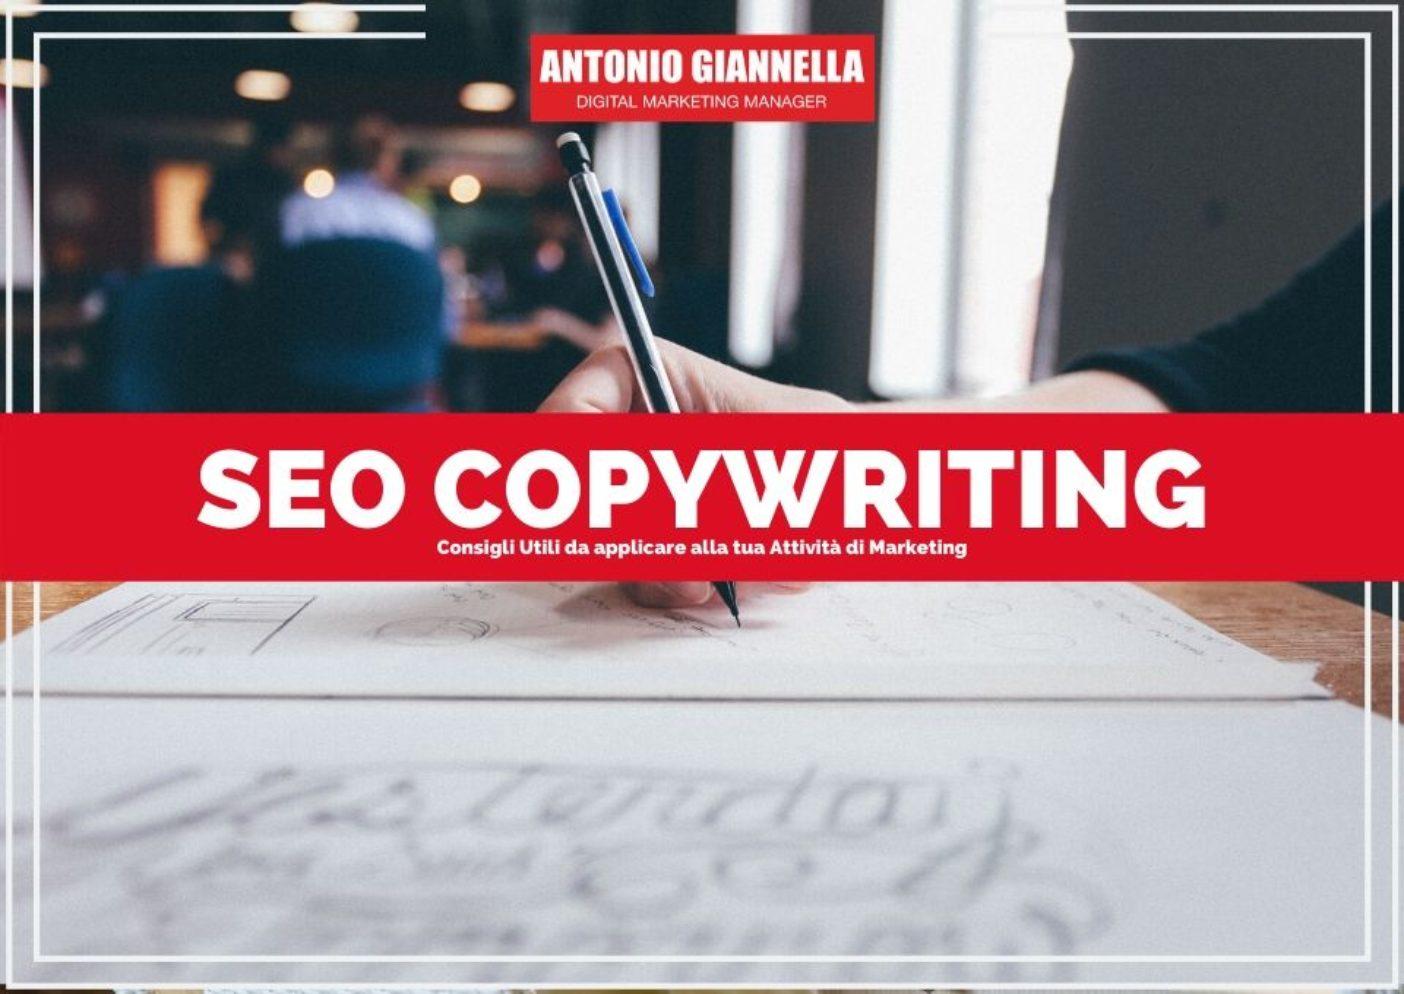 seo copywriting, Seo Copywriting